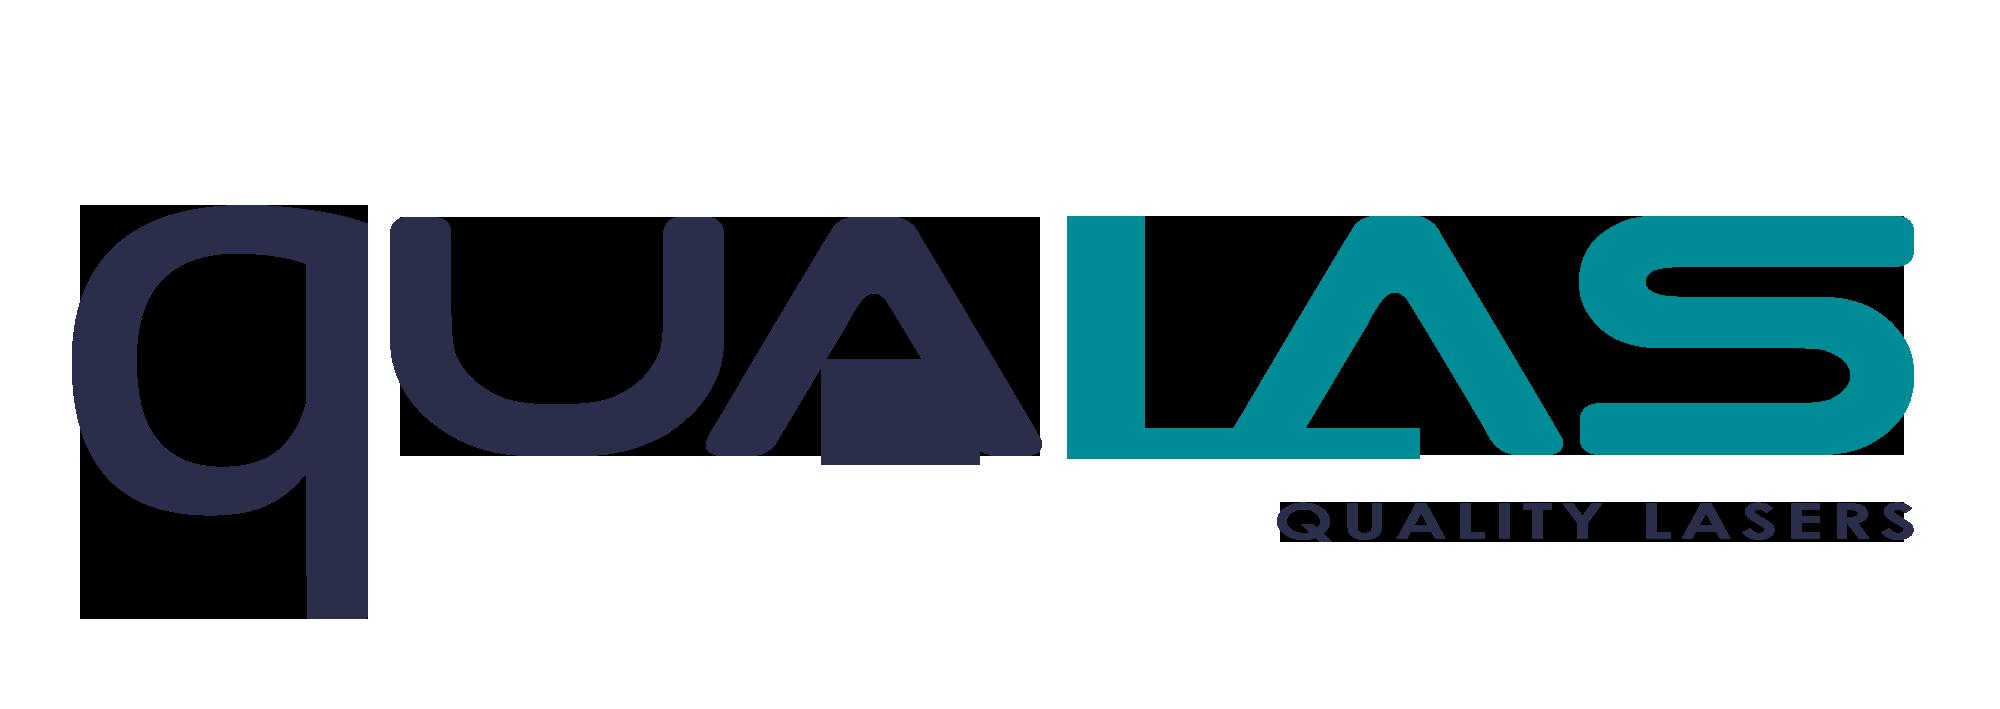 Qualas – Quality Lasers